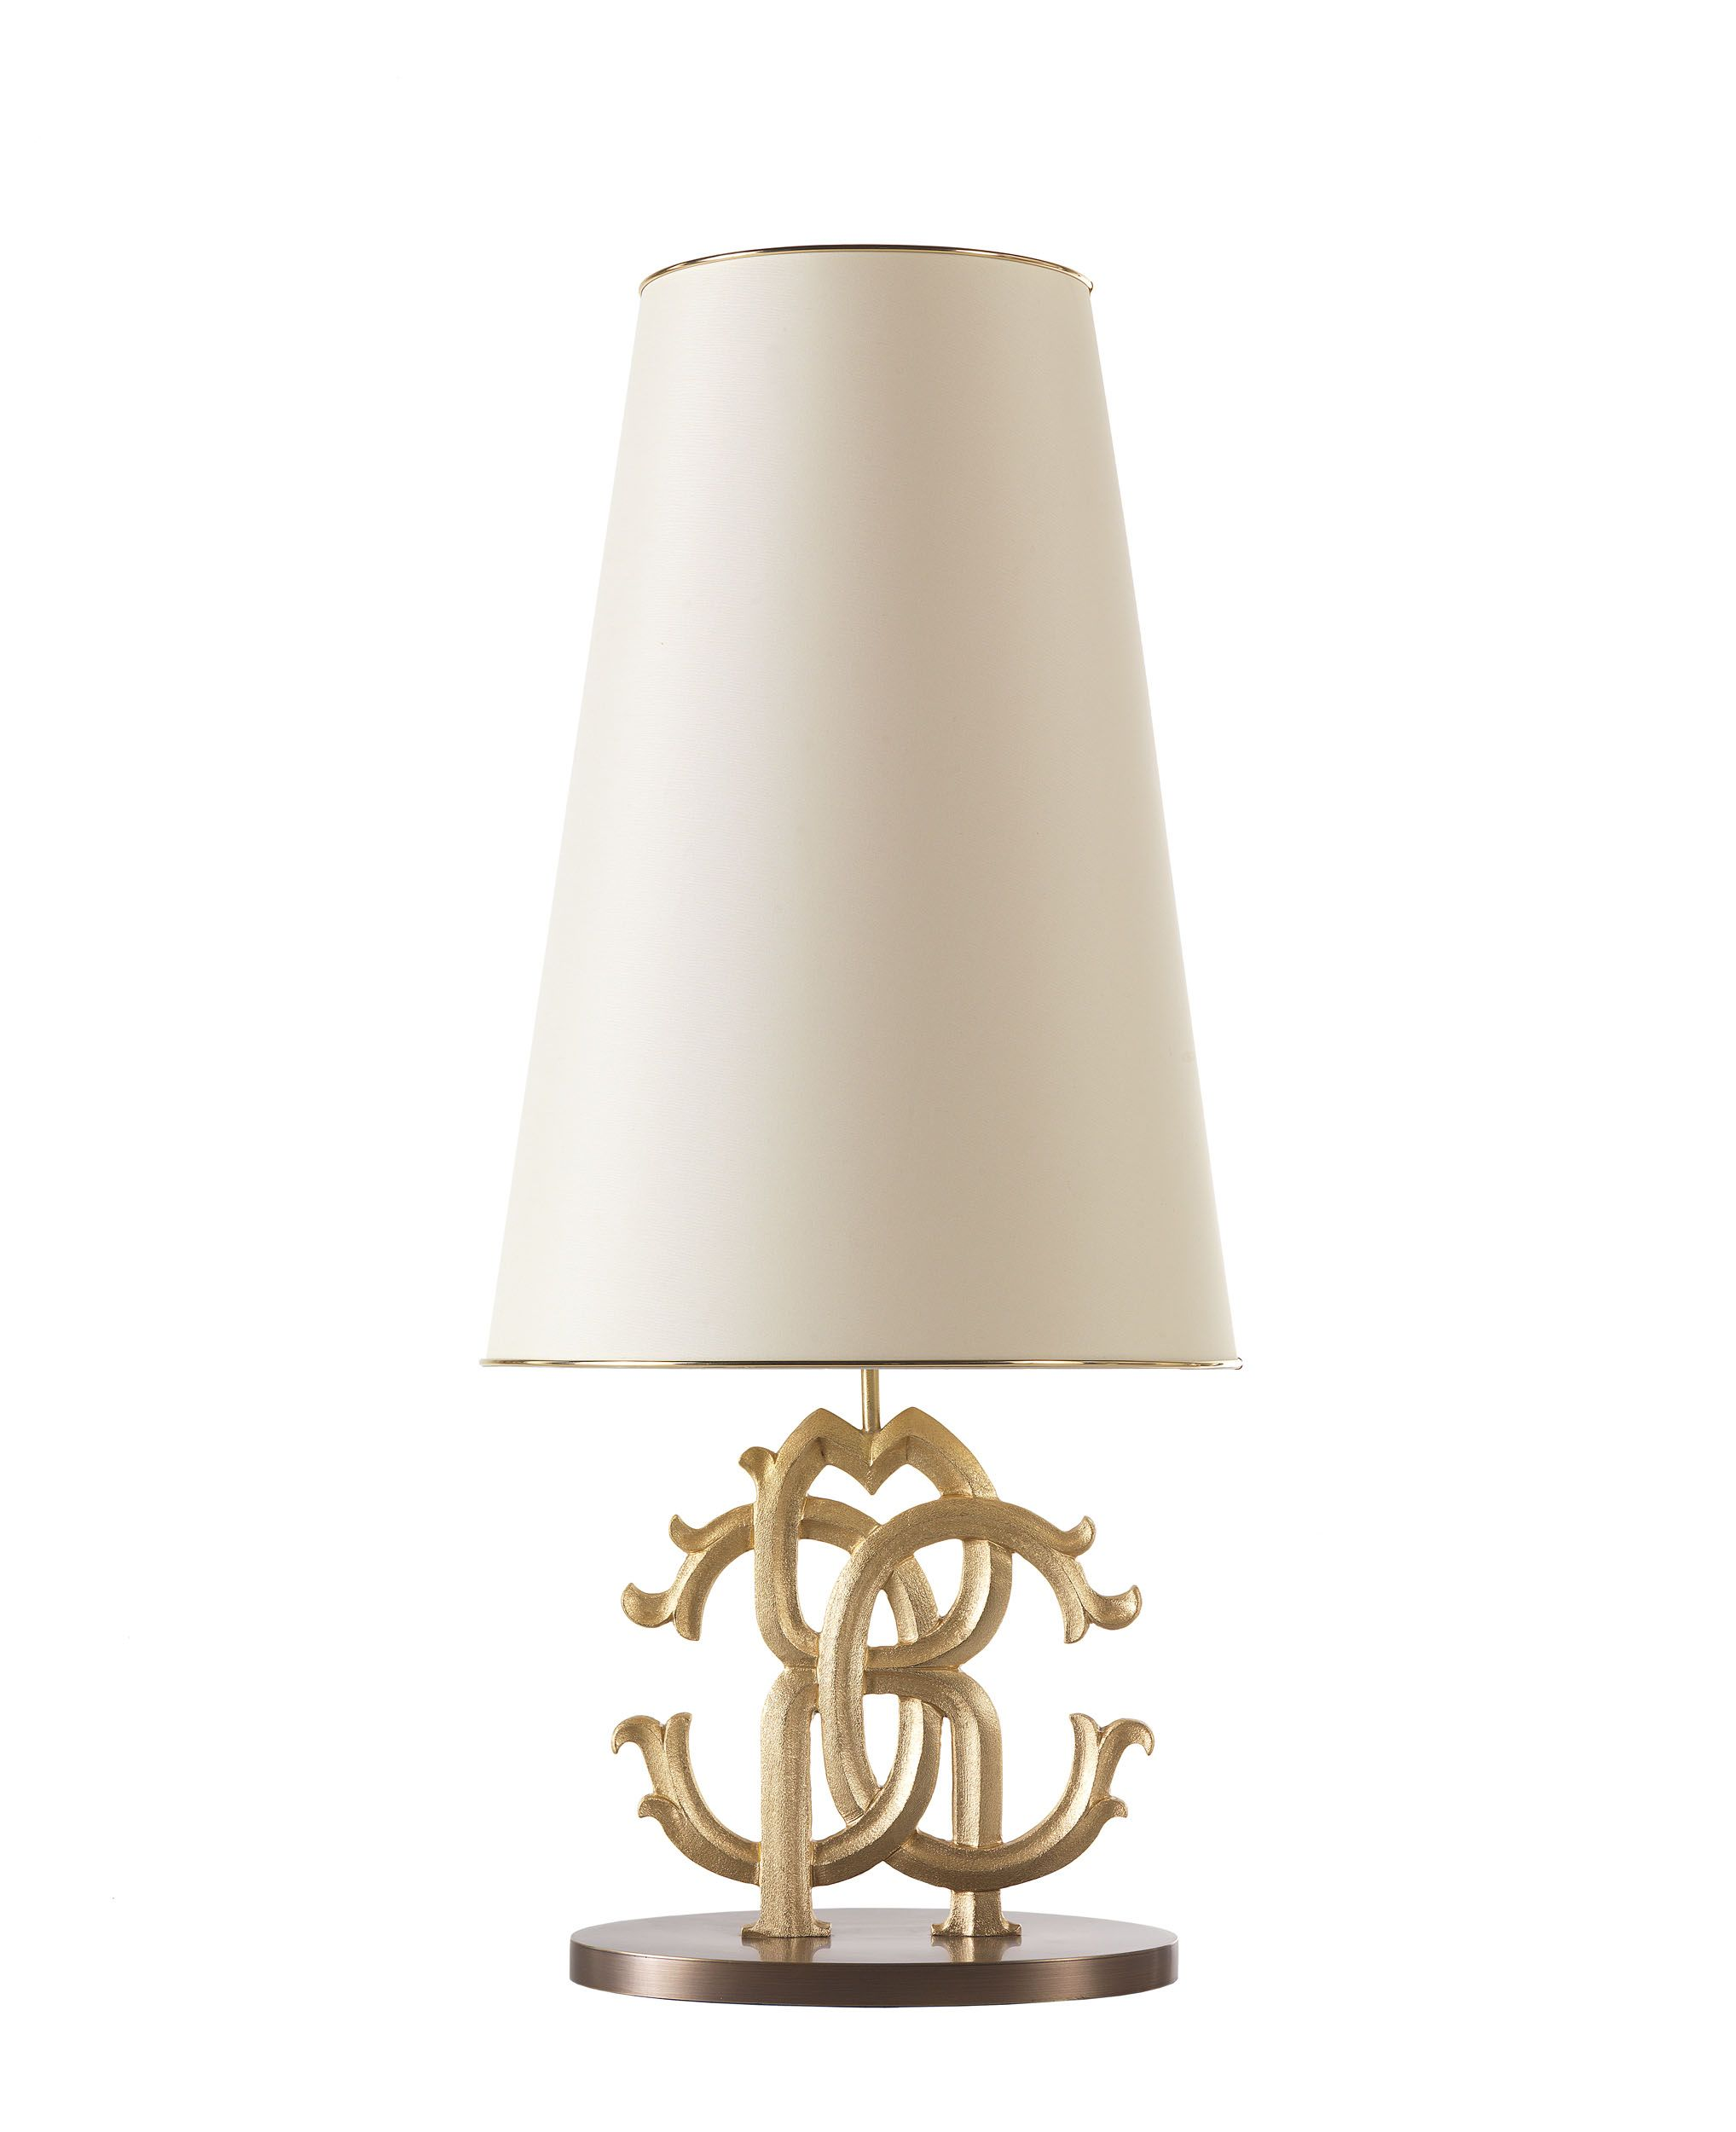 Roberto Cavalli Home Australia Rc Logo Table Lamp Palazzocollezioni Robertocavalli Robertocavallihome